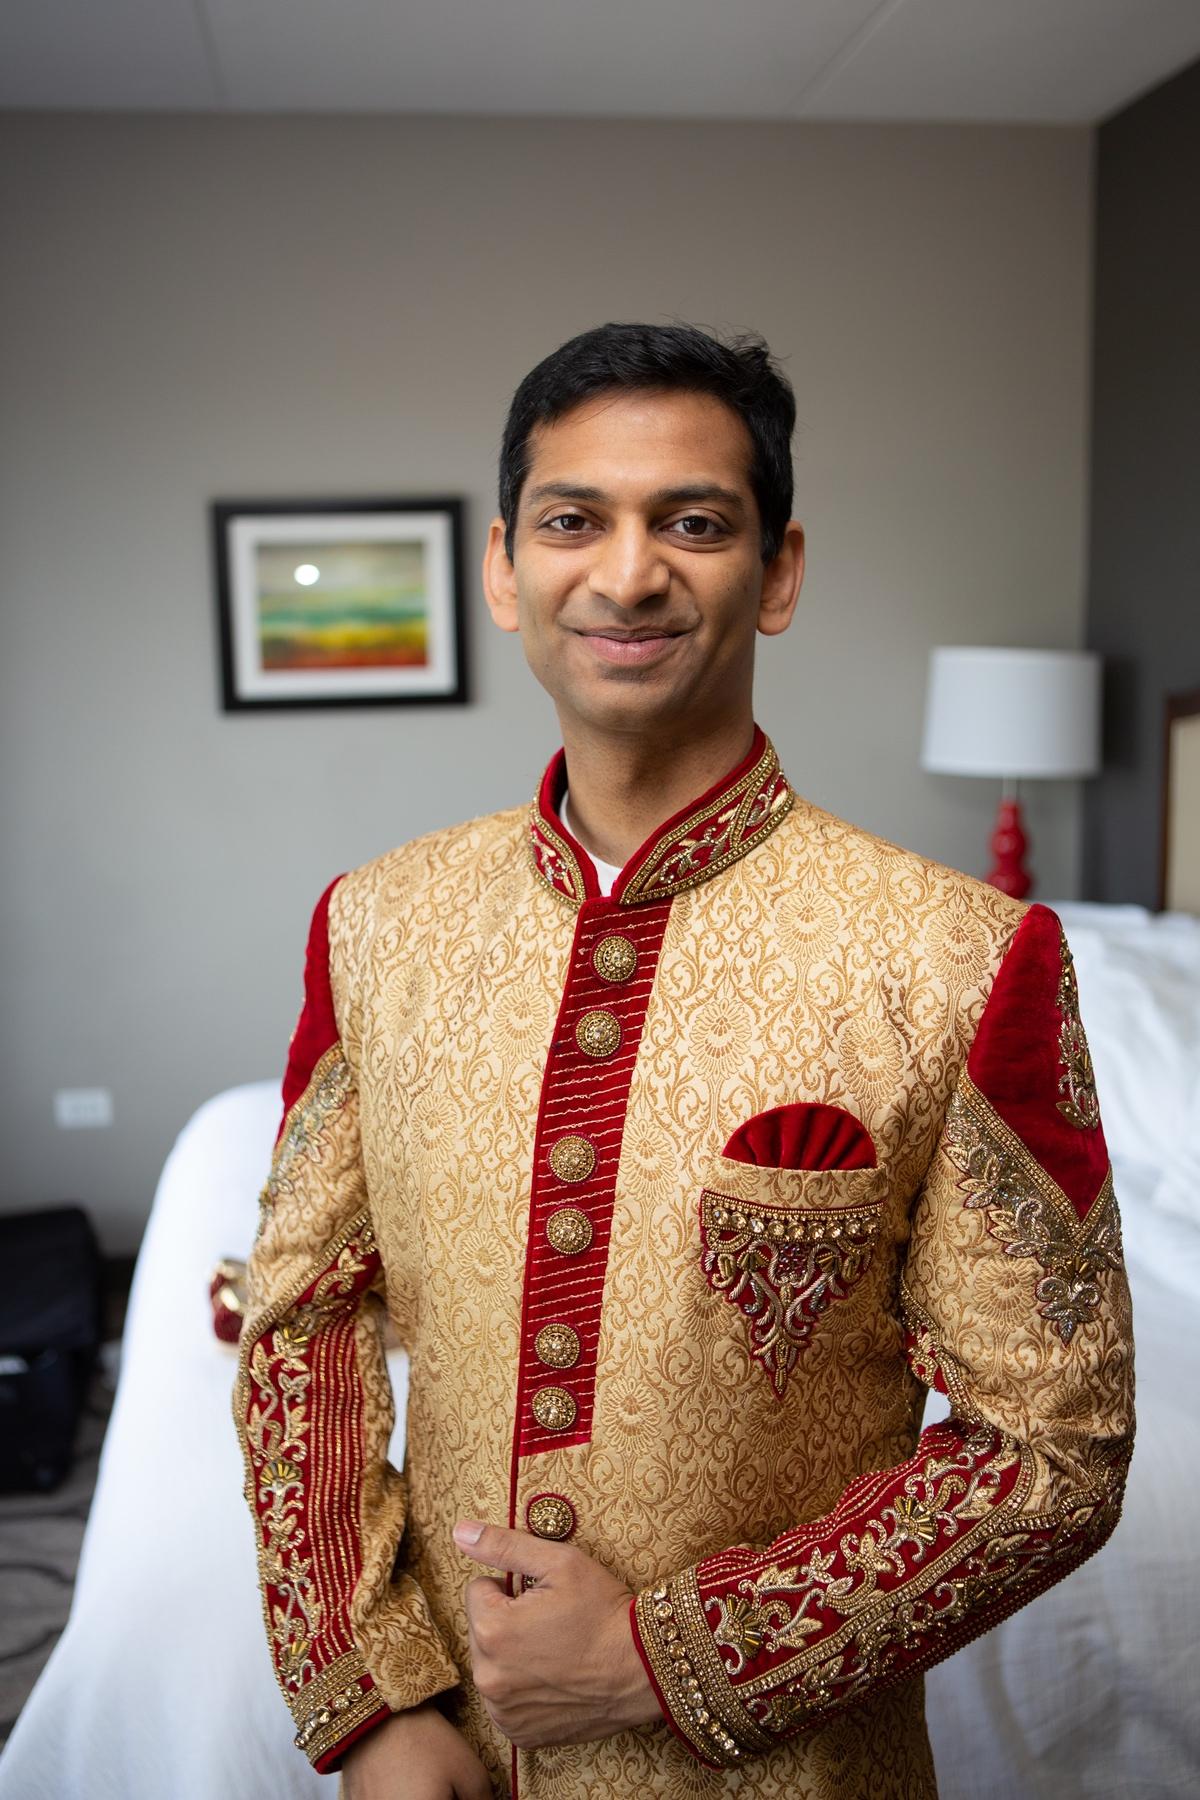 Le Cape Weddings - South Asian Wedding - Chicago Wedding Photographer P&V-23.jpg